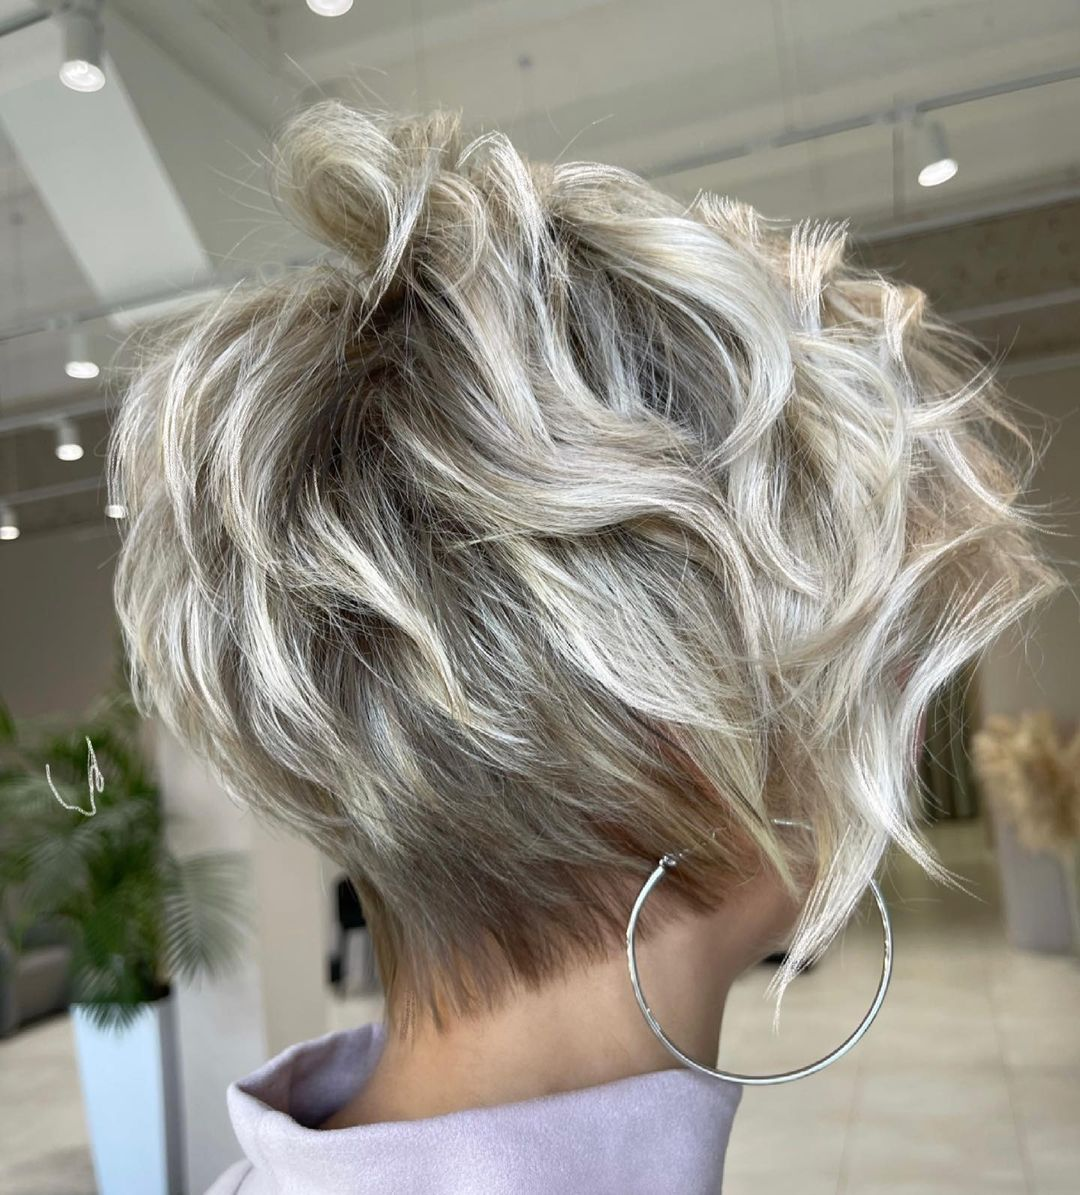 Hübsche kurze wellige Frisuren - Frauen wellige Haarschnitte für kurzes Haar